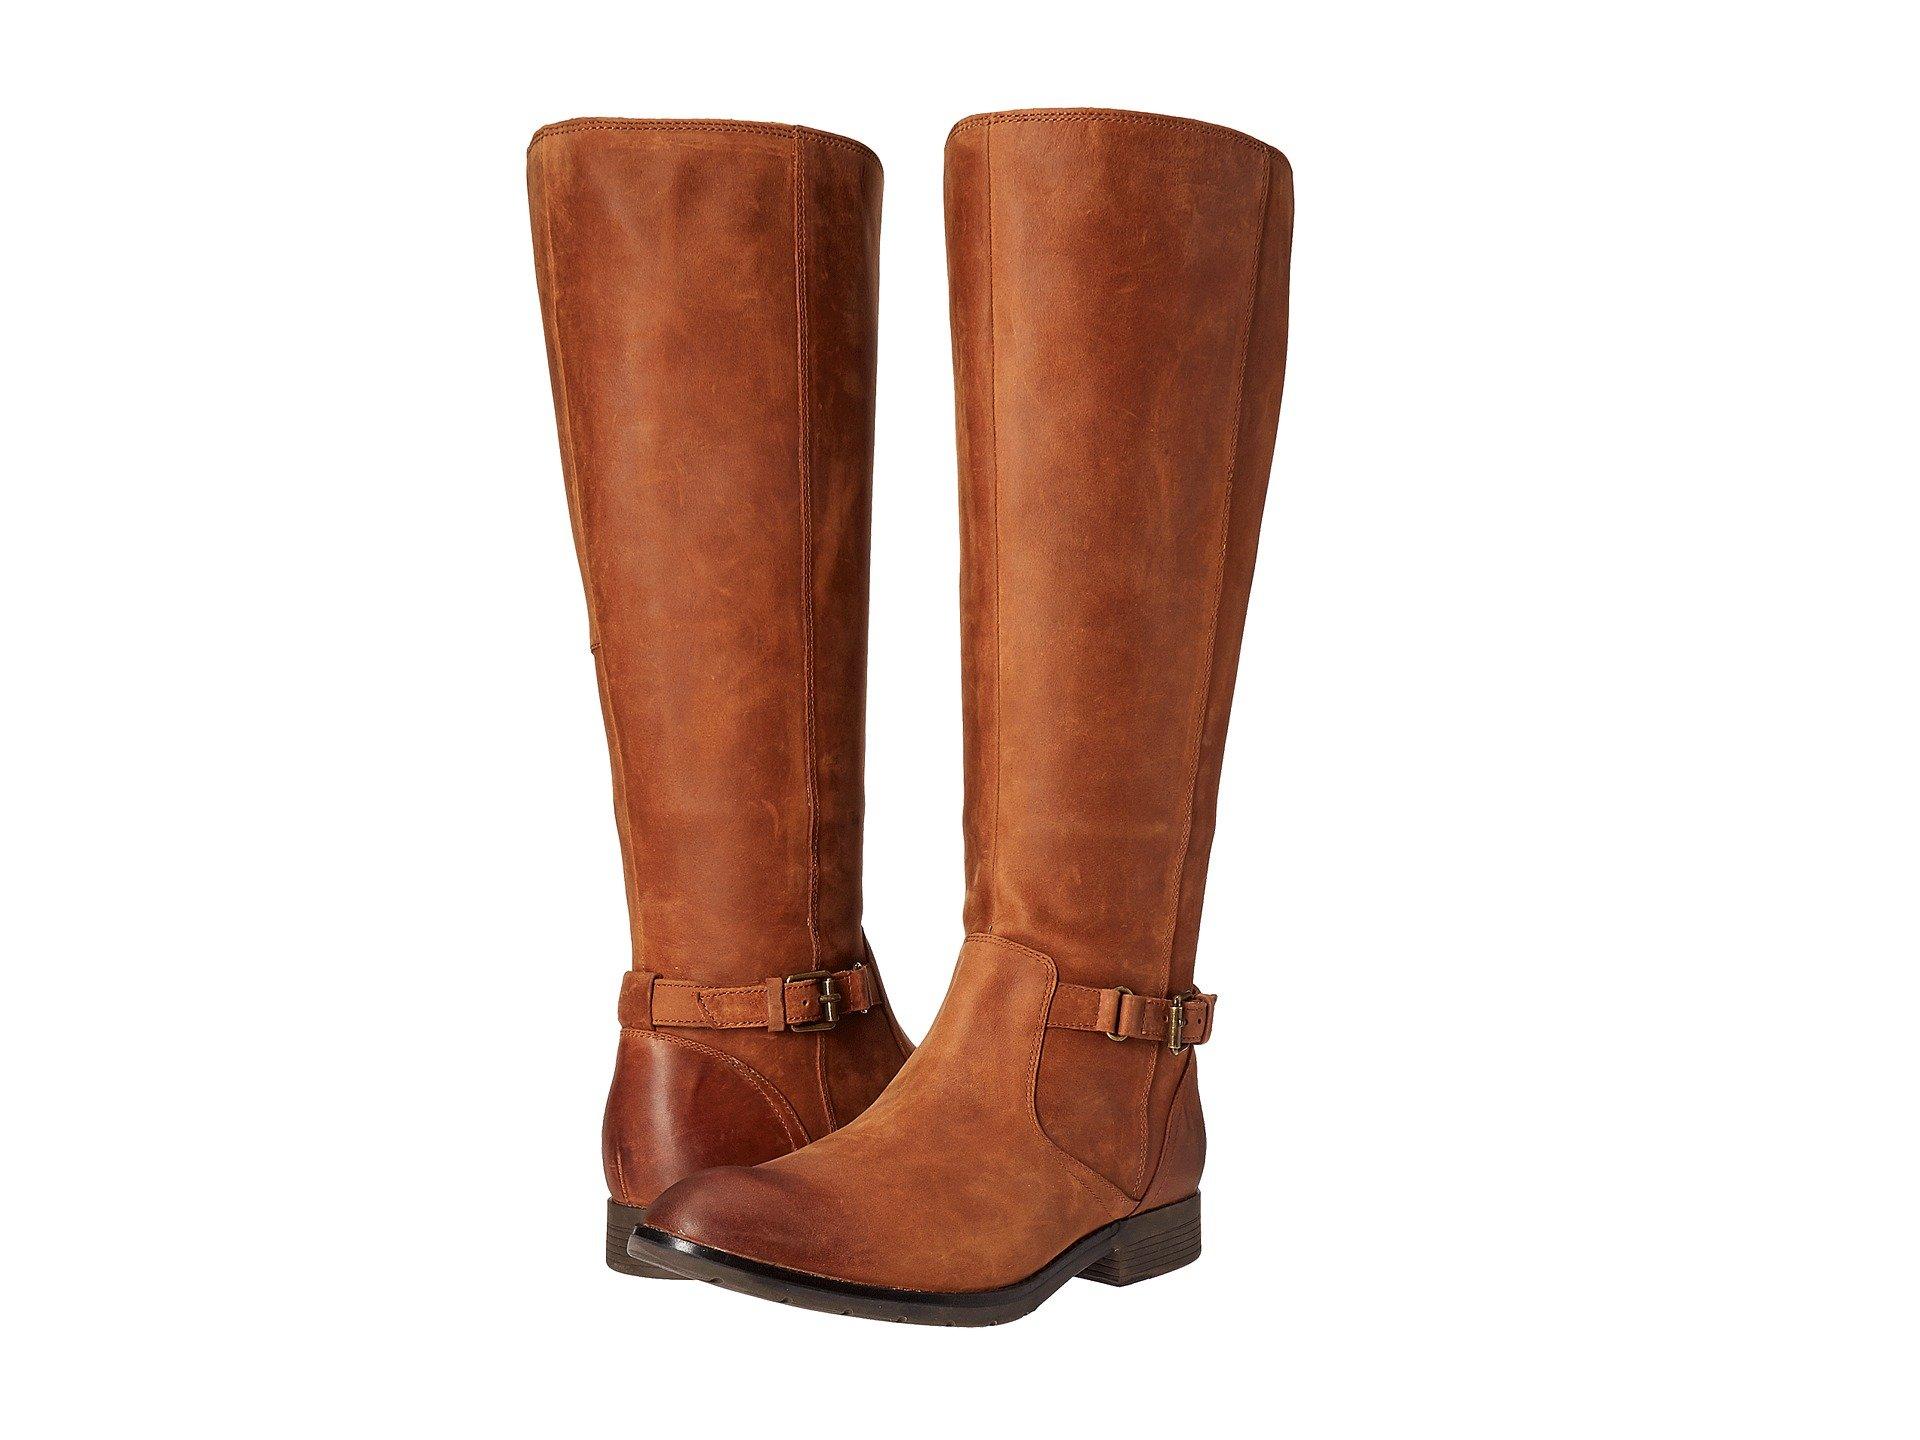 Nashoba High Boot Waterproof